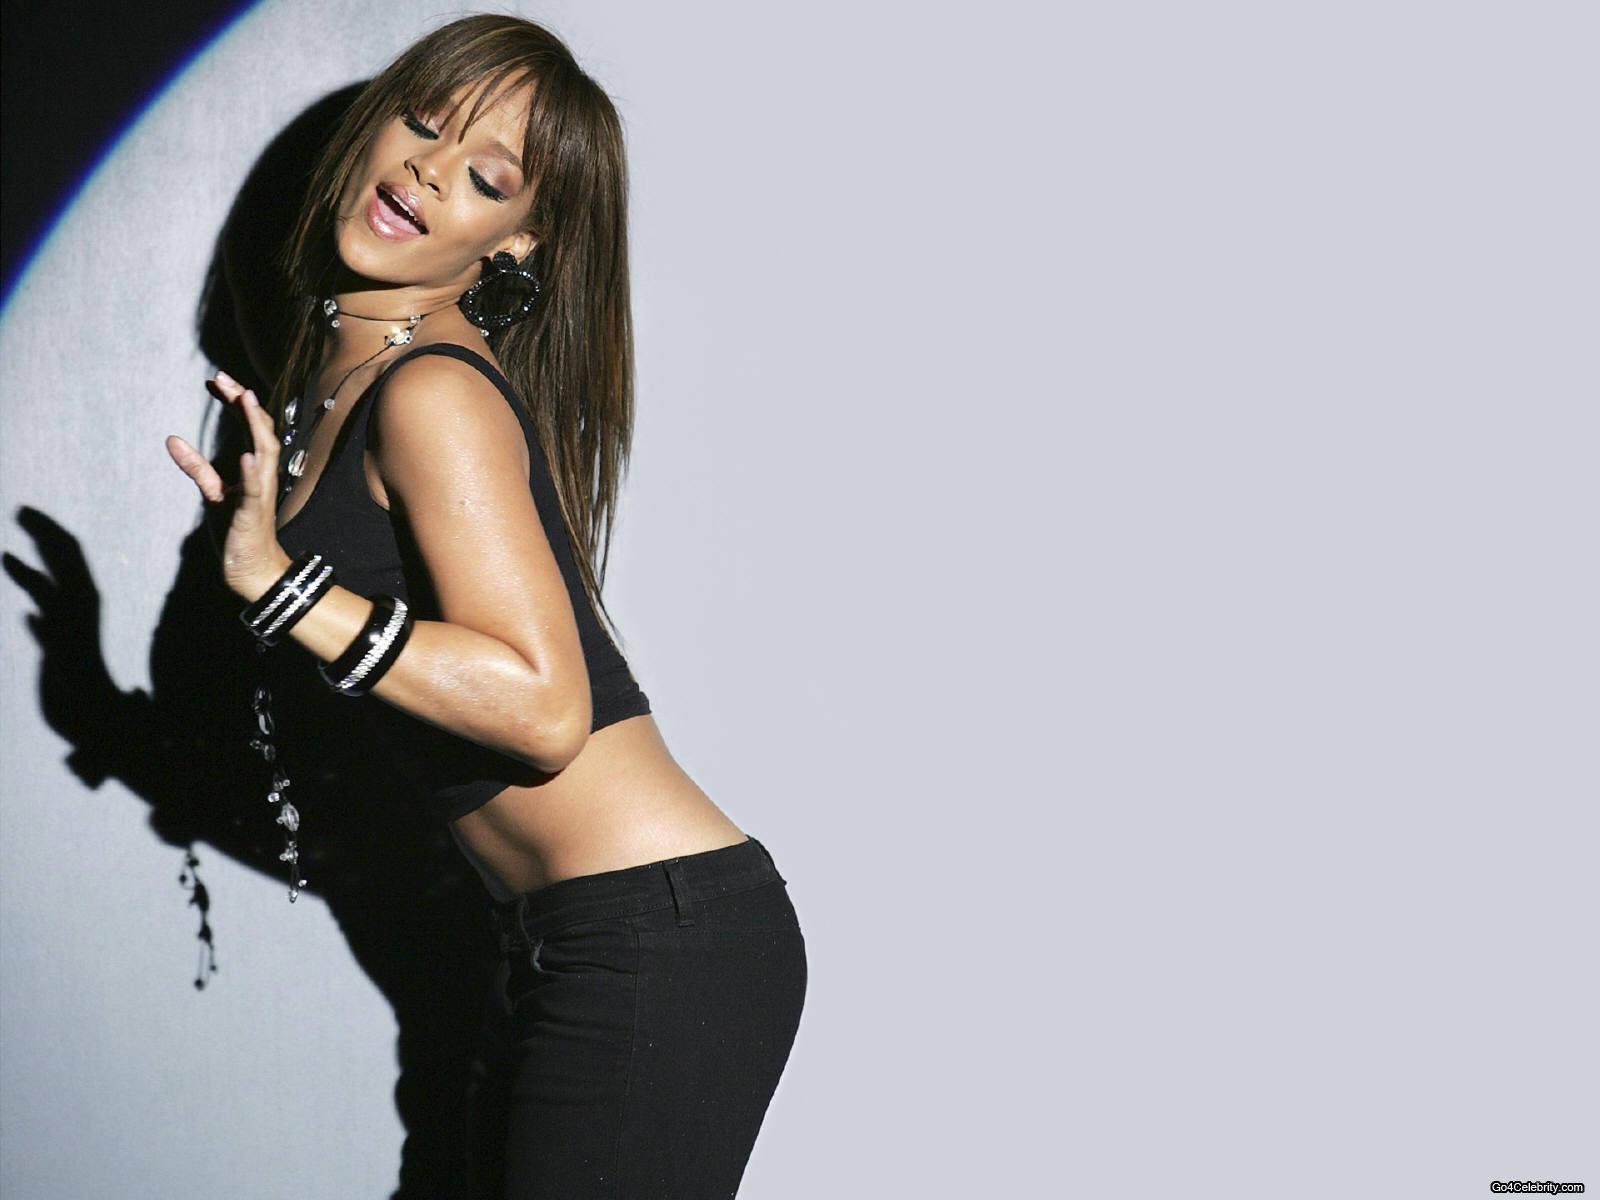 http://images2.fanpop.com/images/photos/6800000/Rihanna-rihanna-6848074-1600-1200.jpg